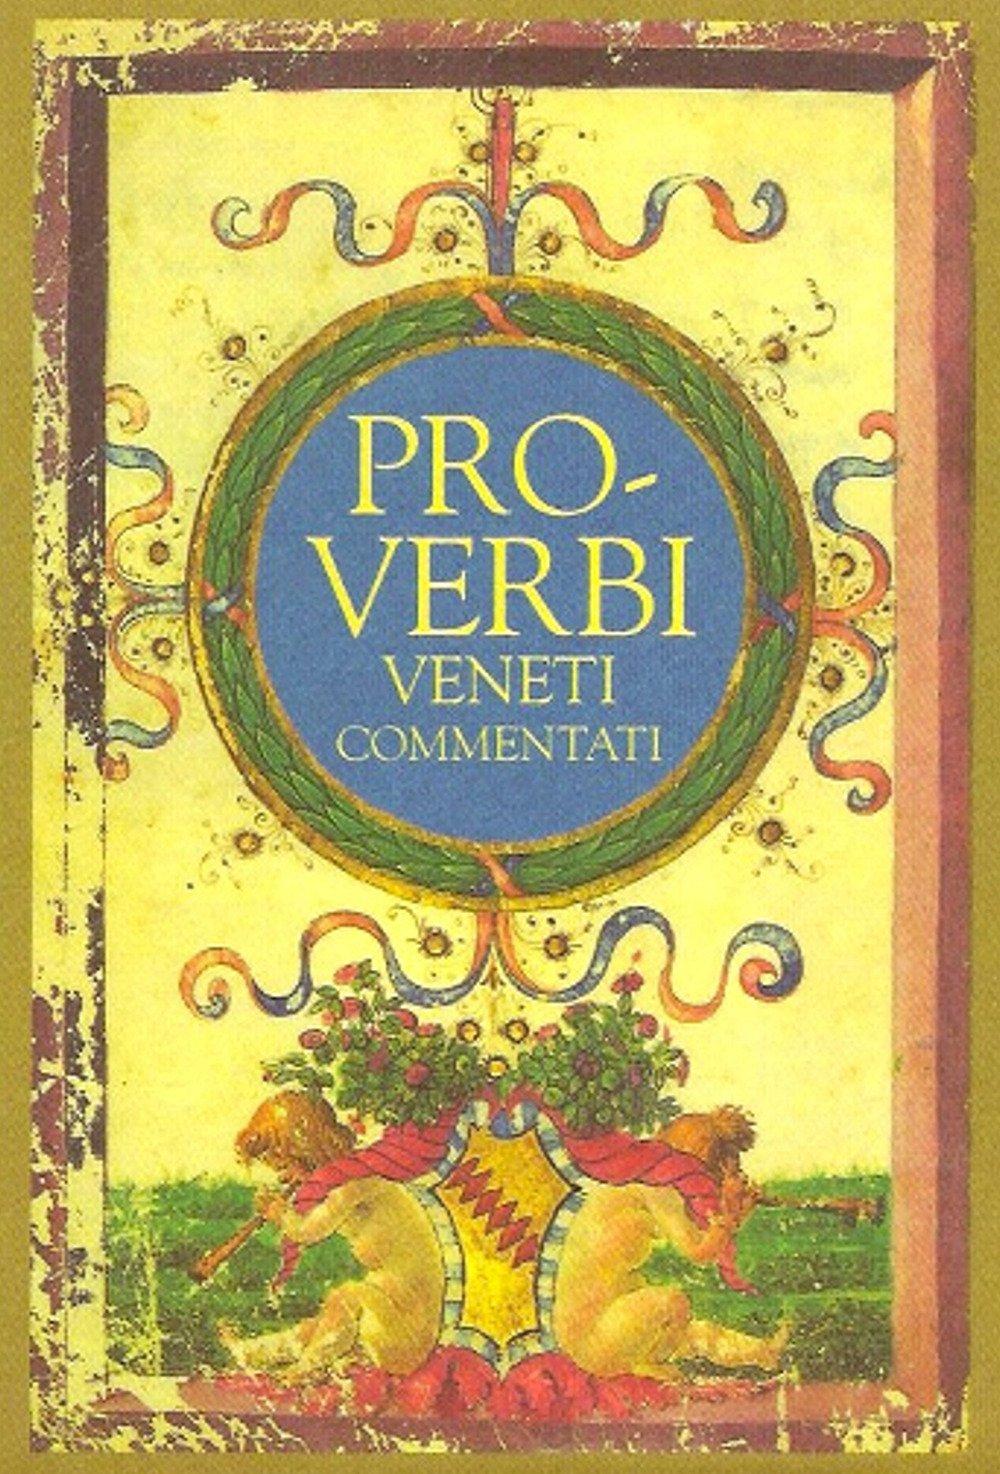 Proverbi commentati veneti